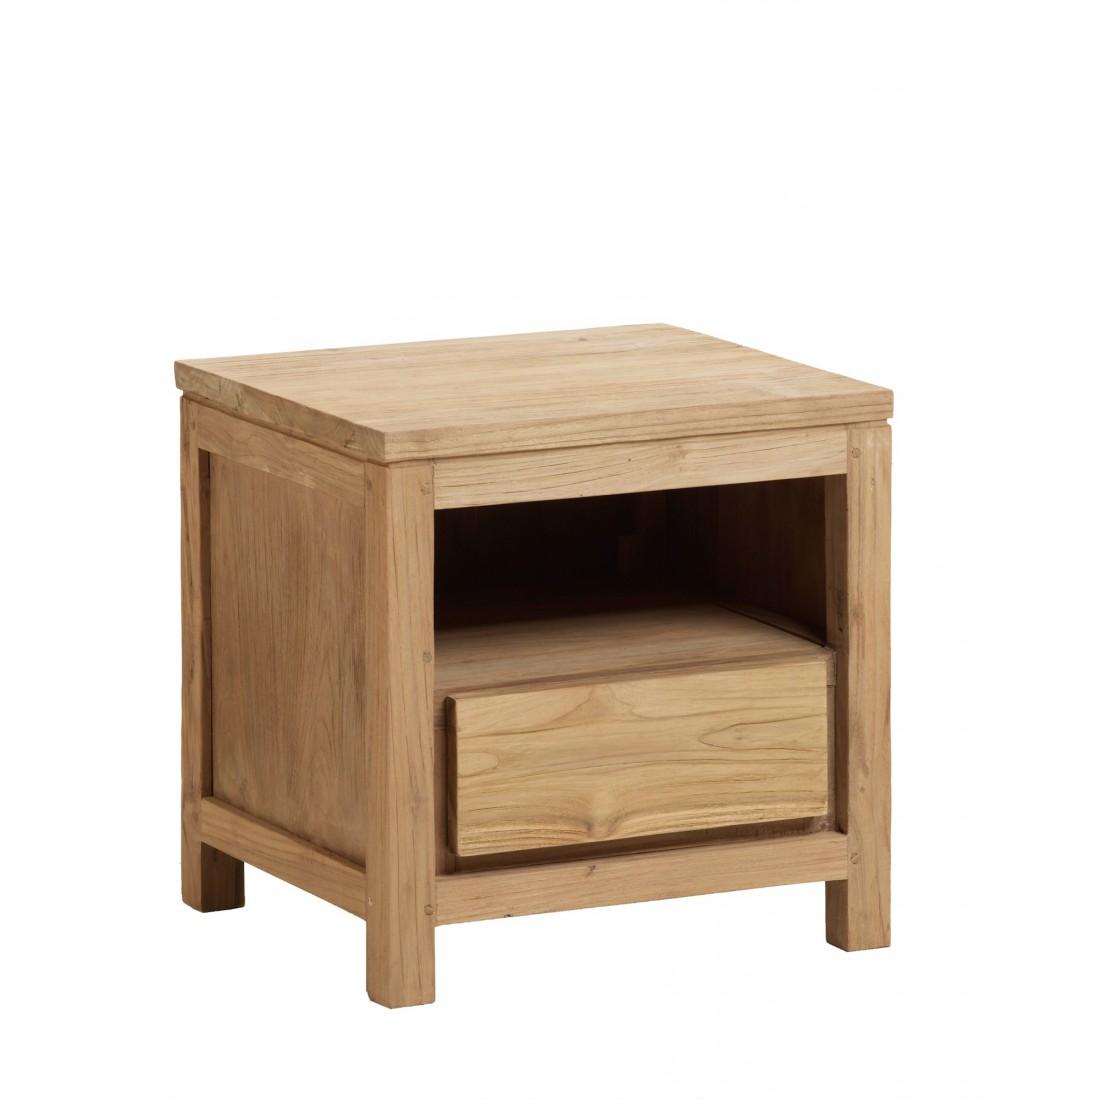 table de chevet en teck recycl bross. Black Bedroom Furniture Sets. Home Design Ideas